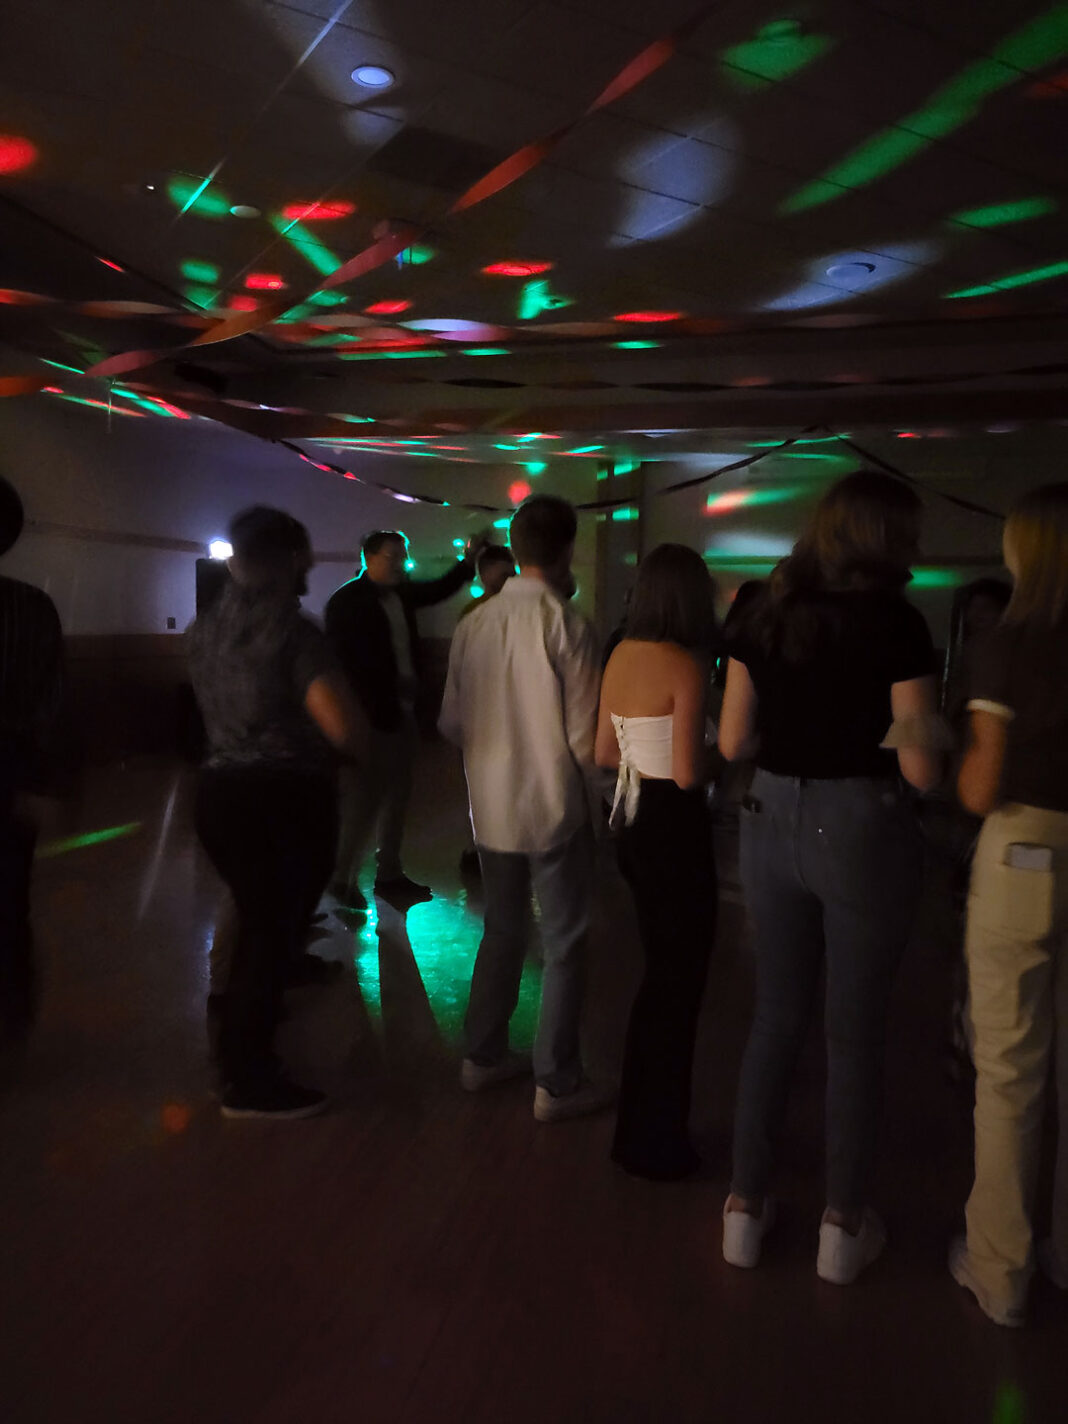 People dancing under flashing lights